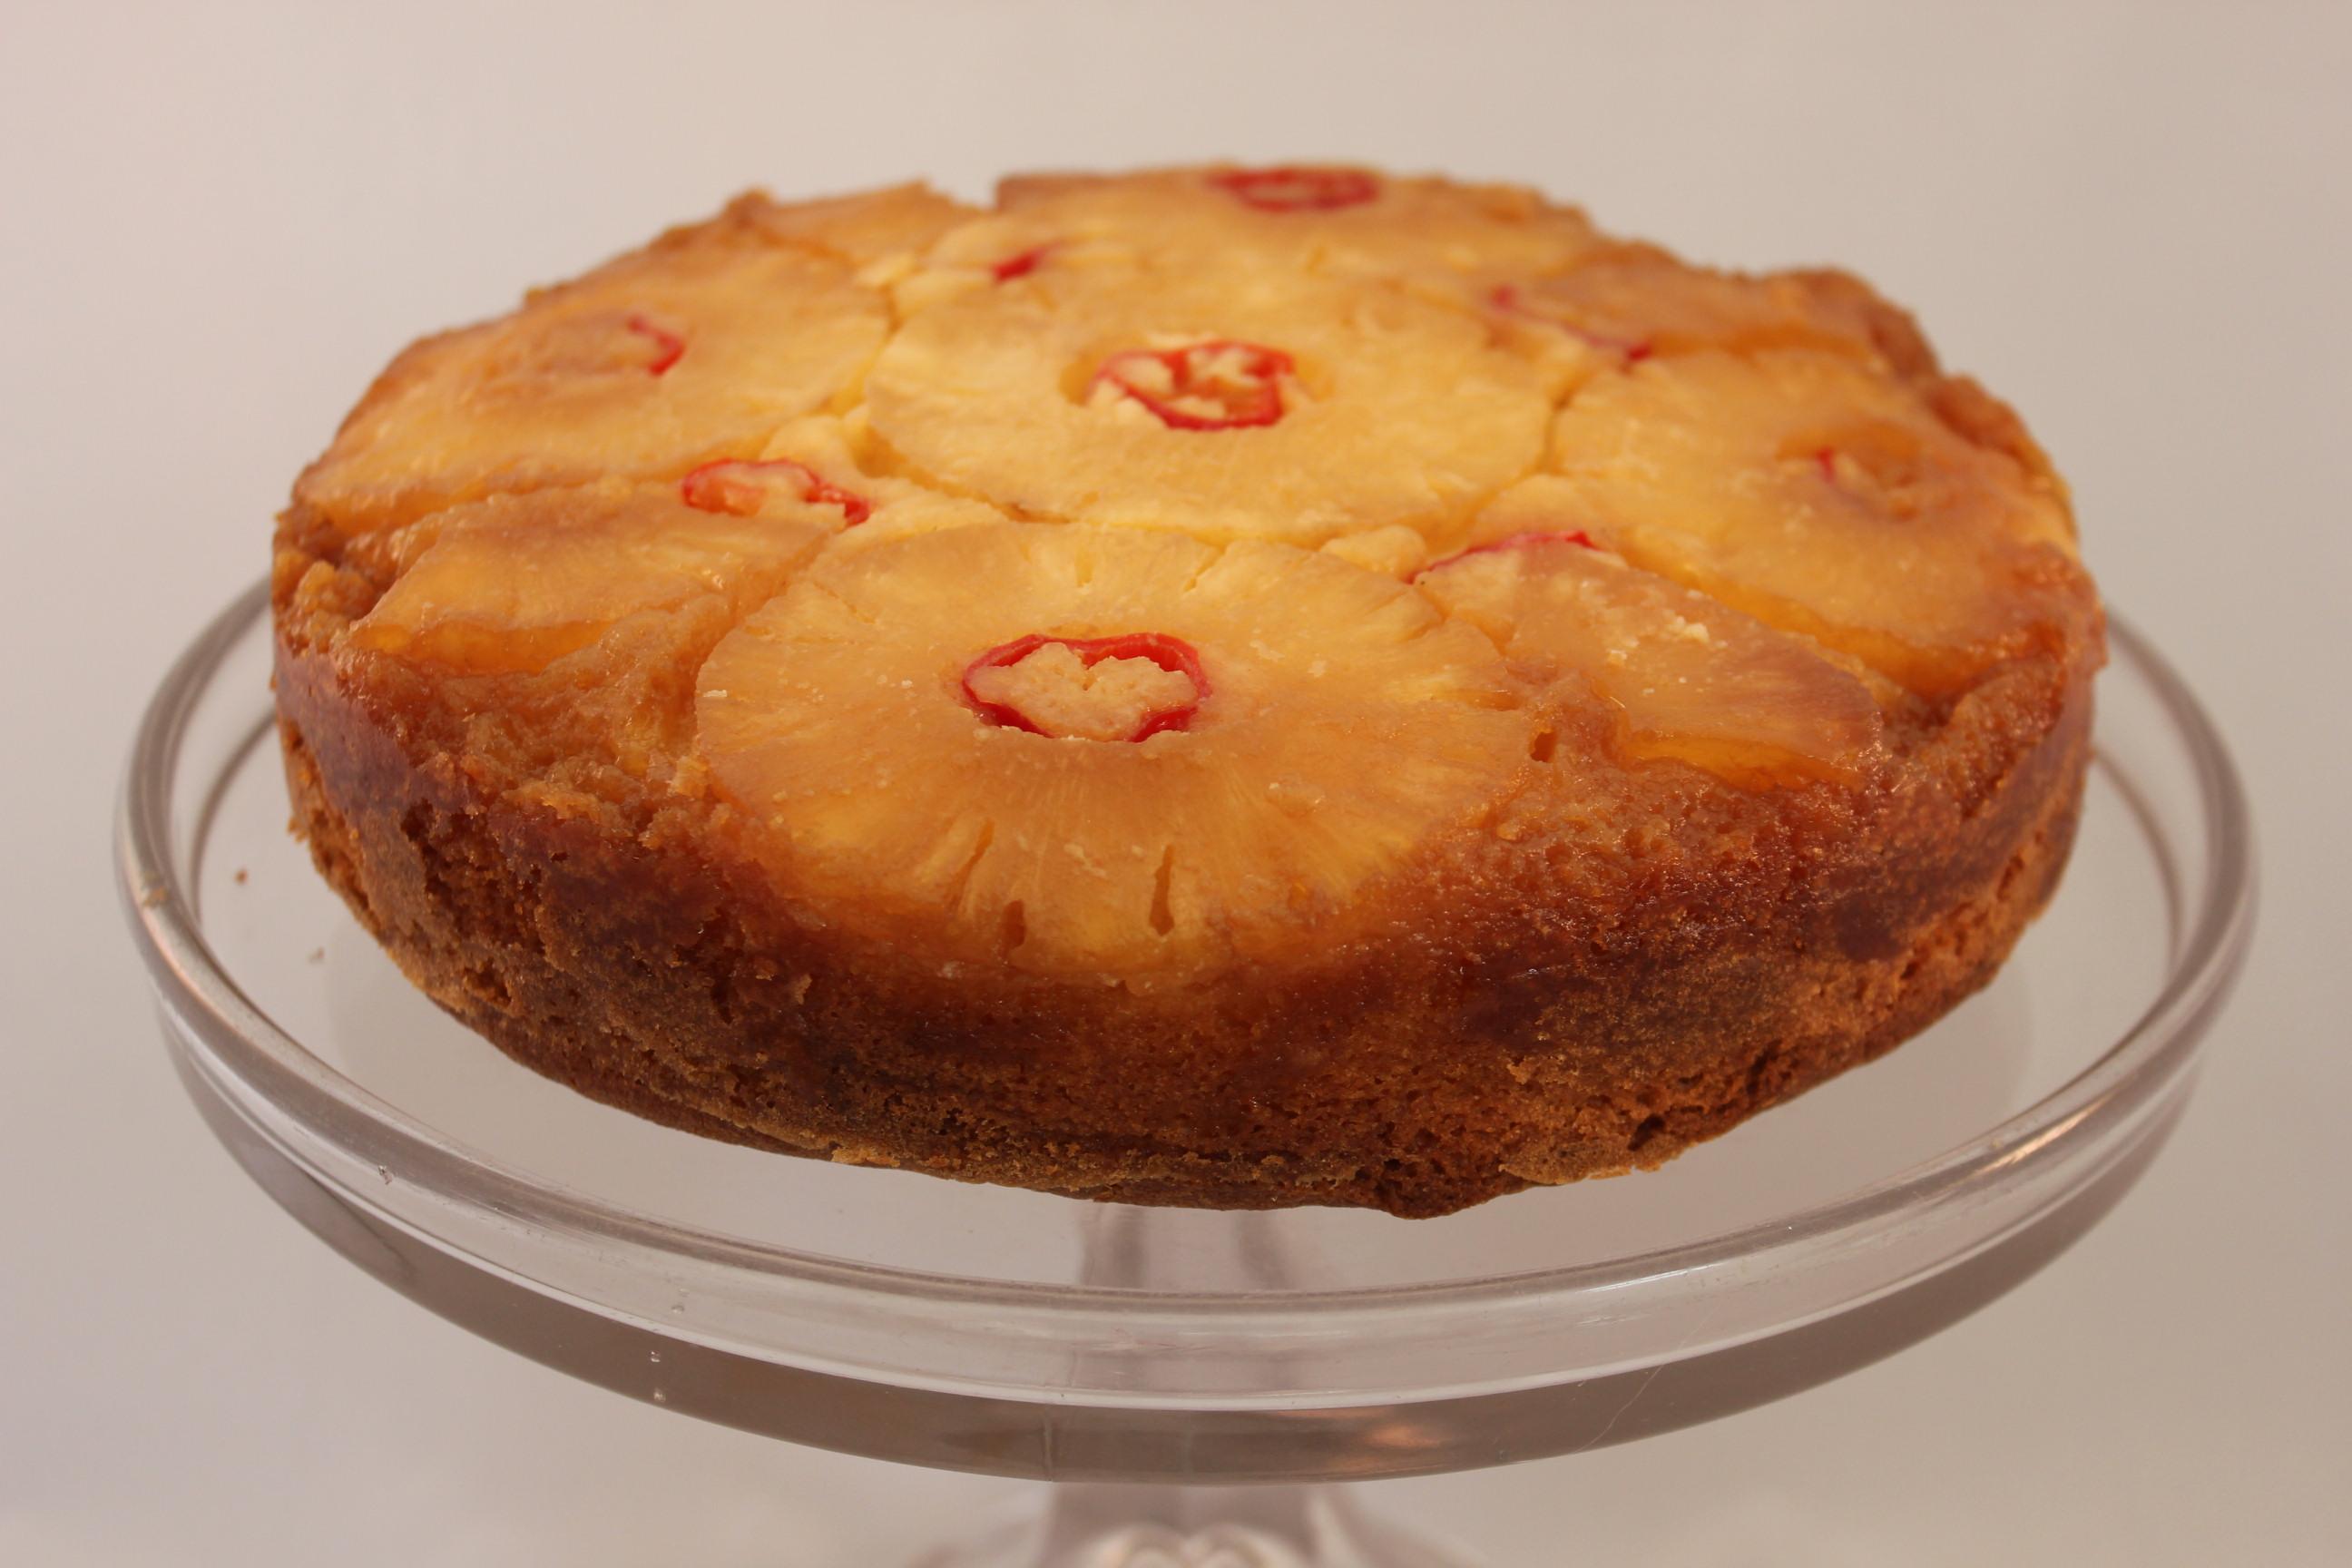 Pineapple Chilli Cake